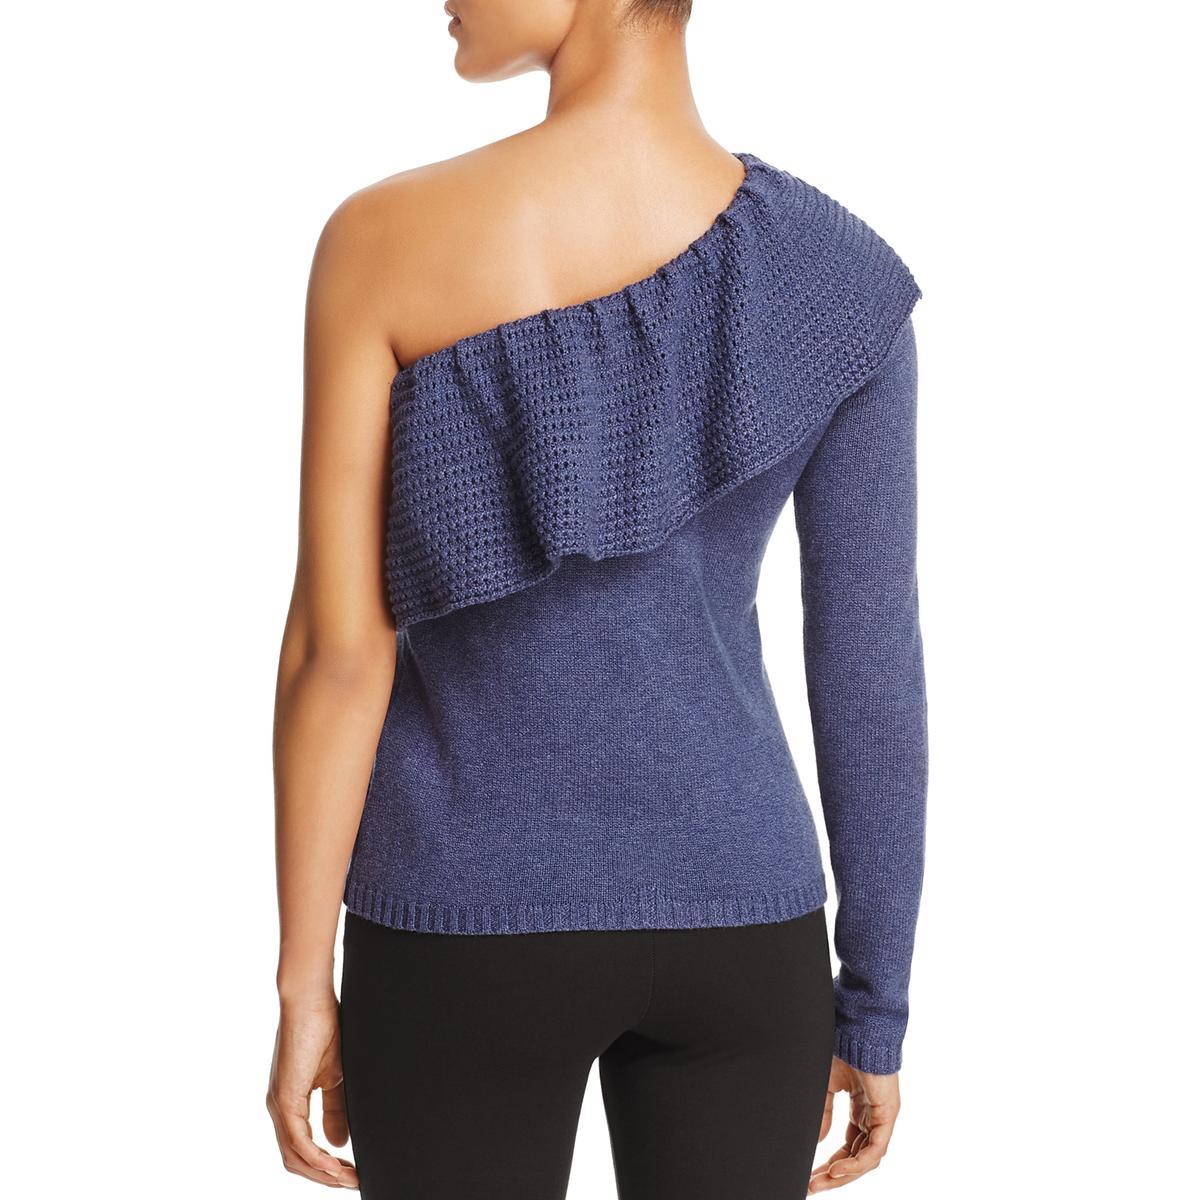 Moss Shoulder Loli Sweater Top One Ella 2475 Bhfo Womens Pullover aCqxwqTd